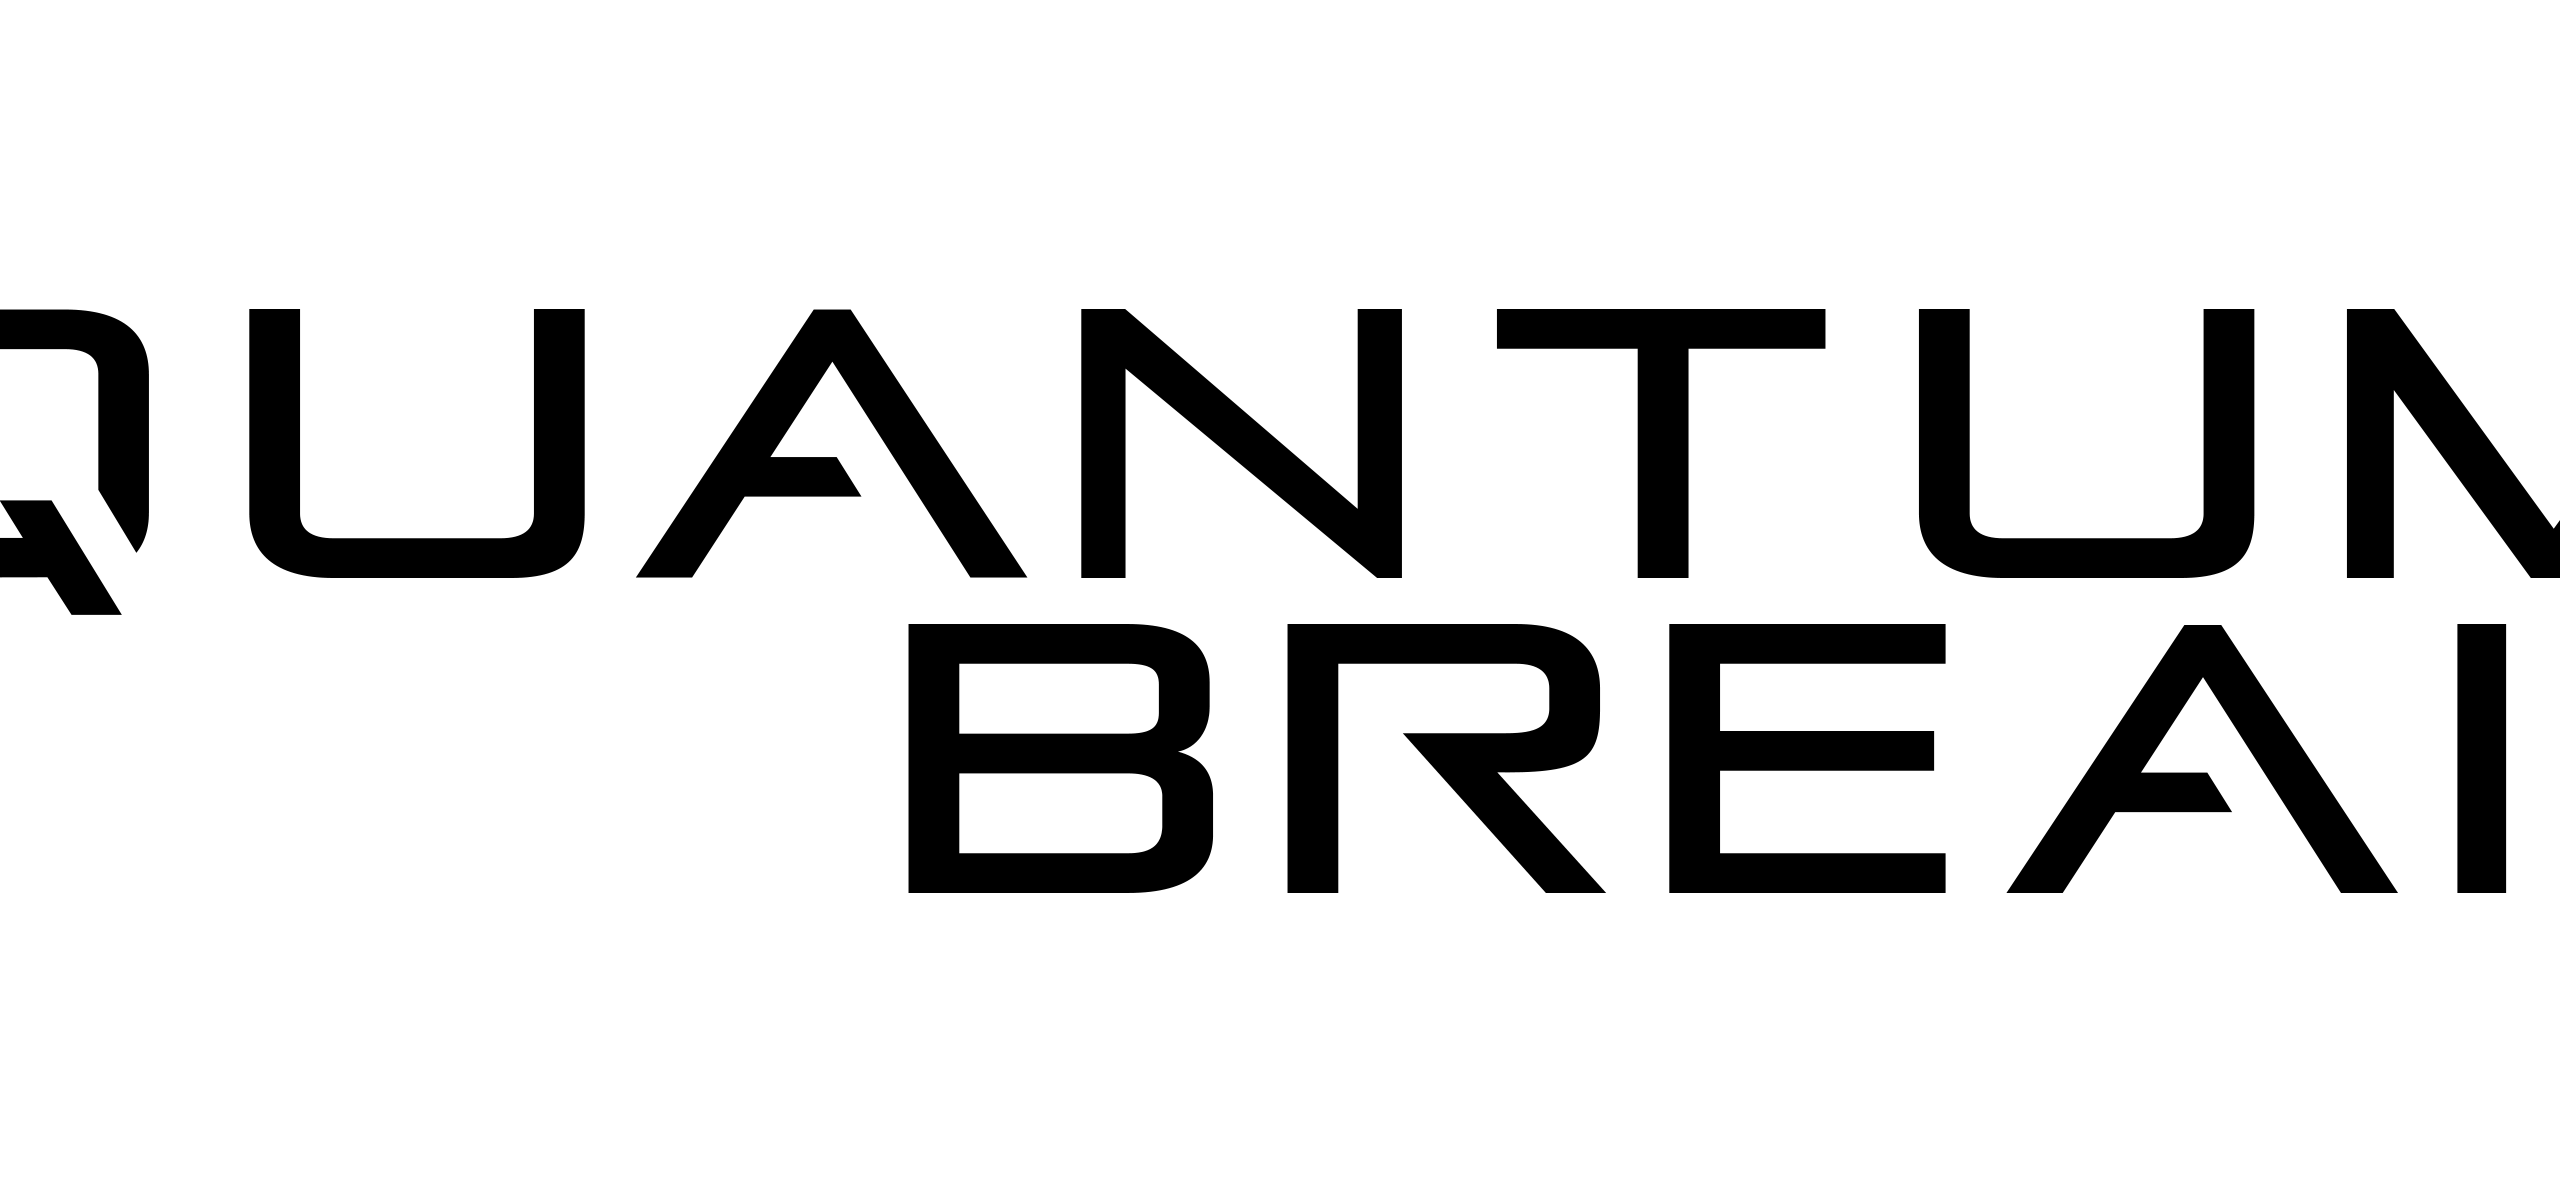 quantum-break-vertical-black-png1